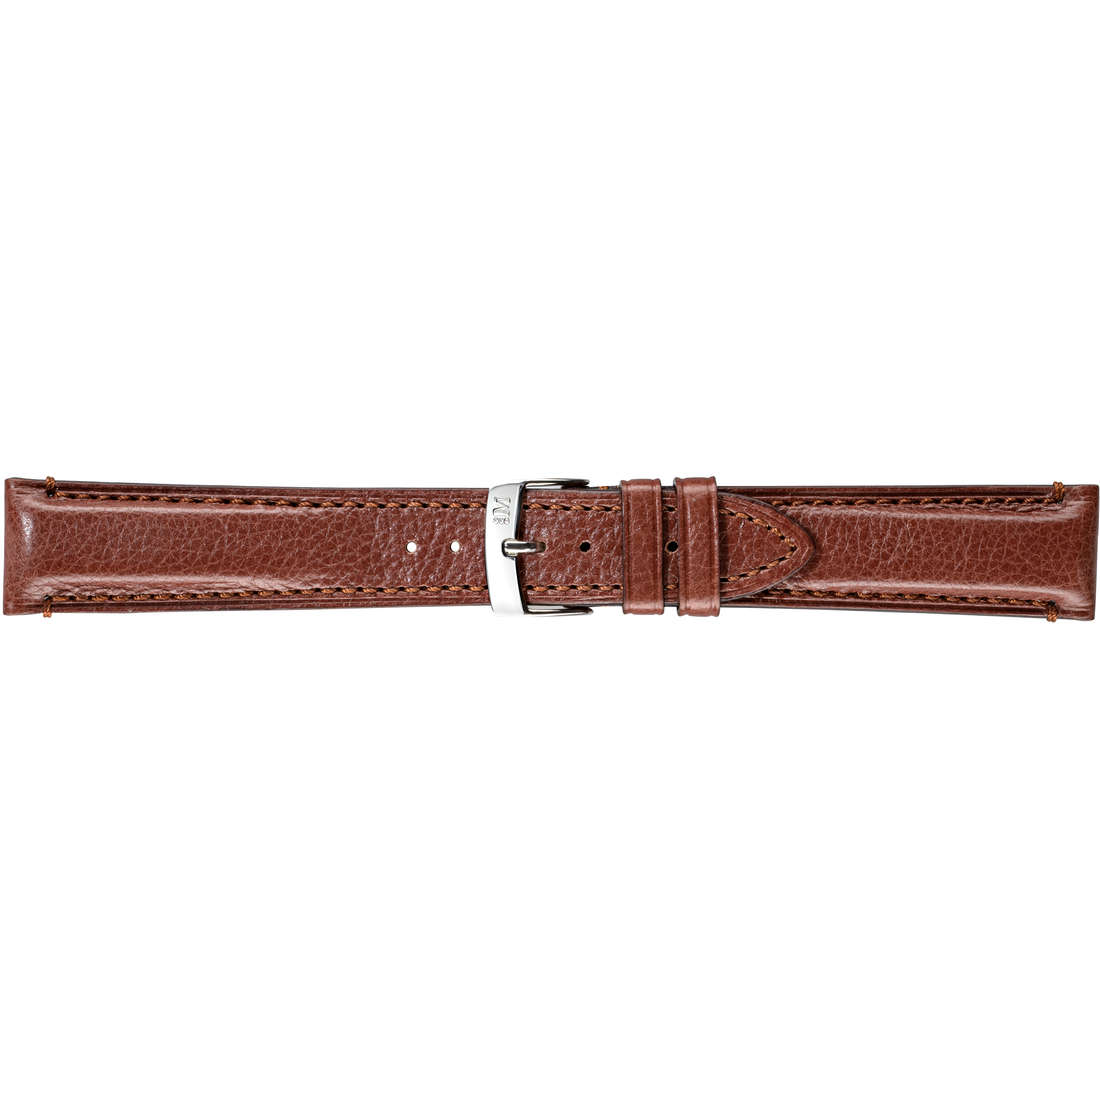 watch watch bands watch straps man Morellato Manufatti A01X4684B73041CR18